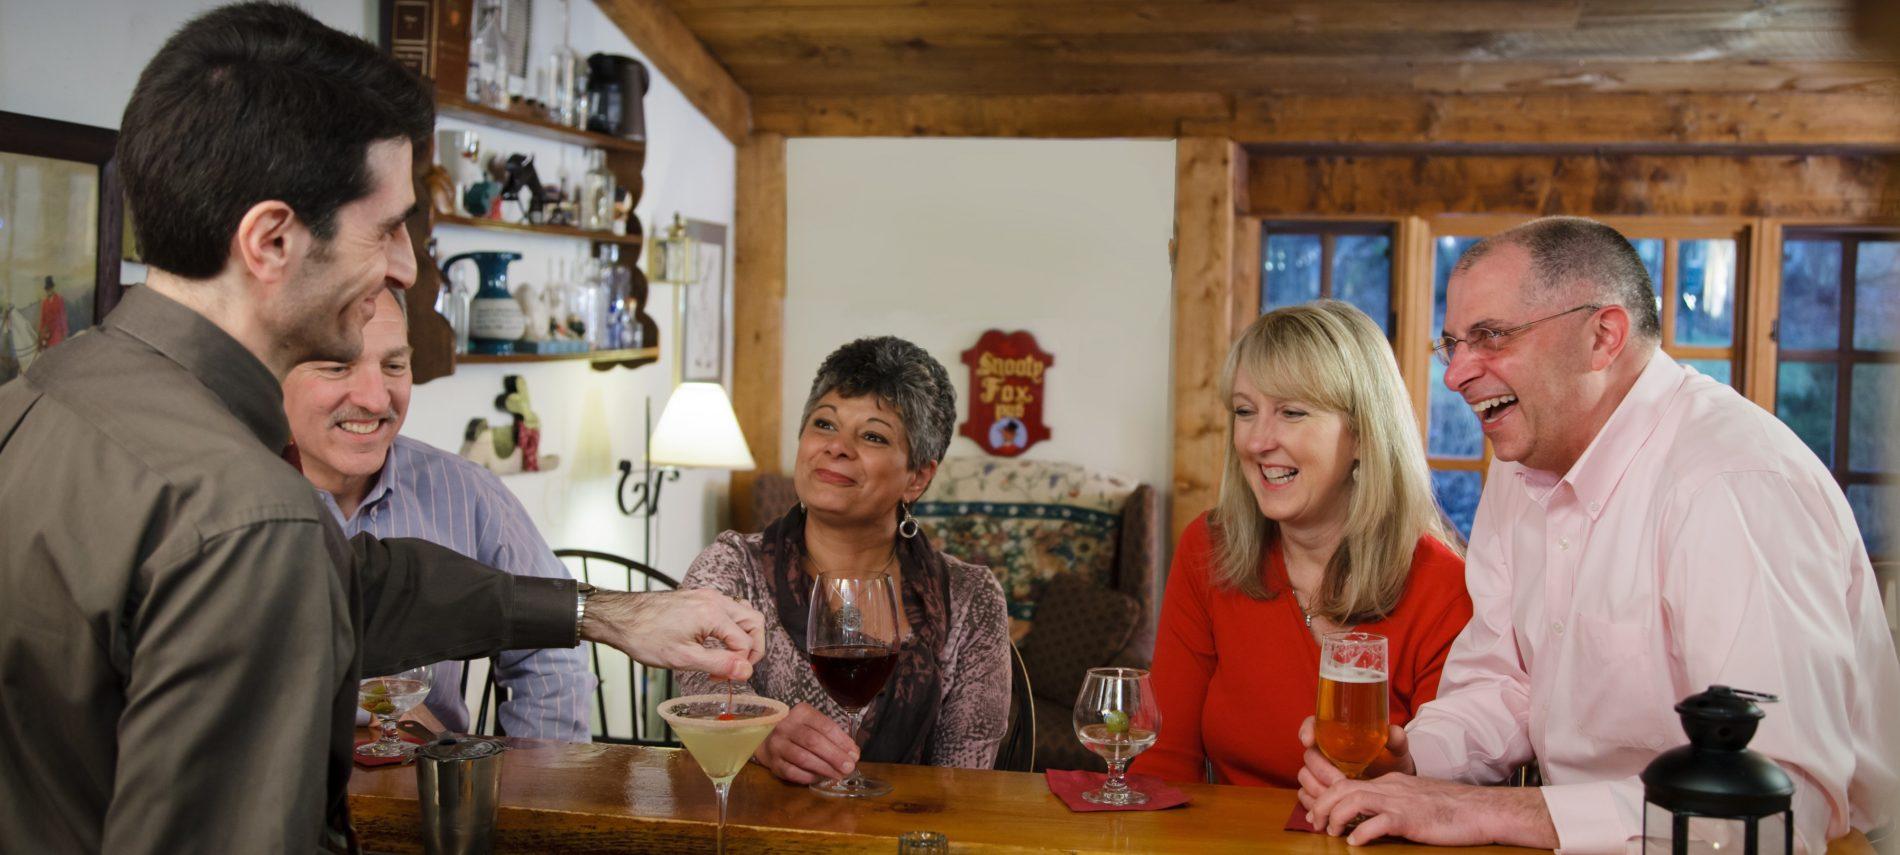 Guests at Snooty Fox Pub, Rabbit Hill Inn